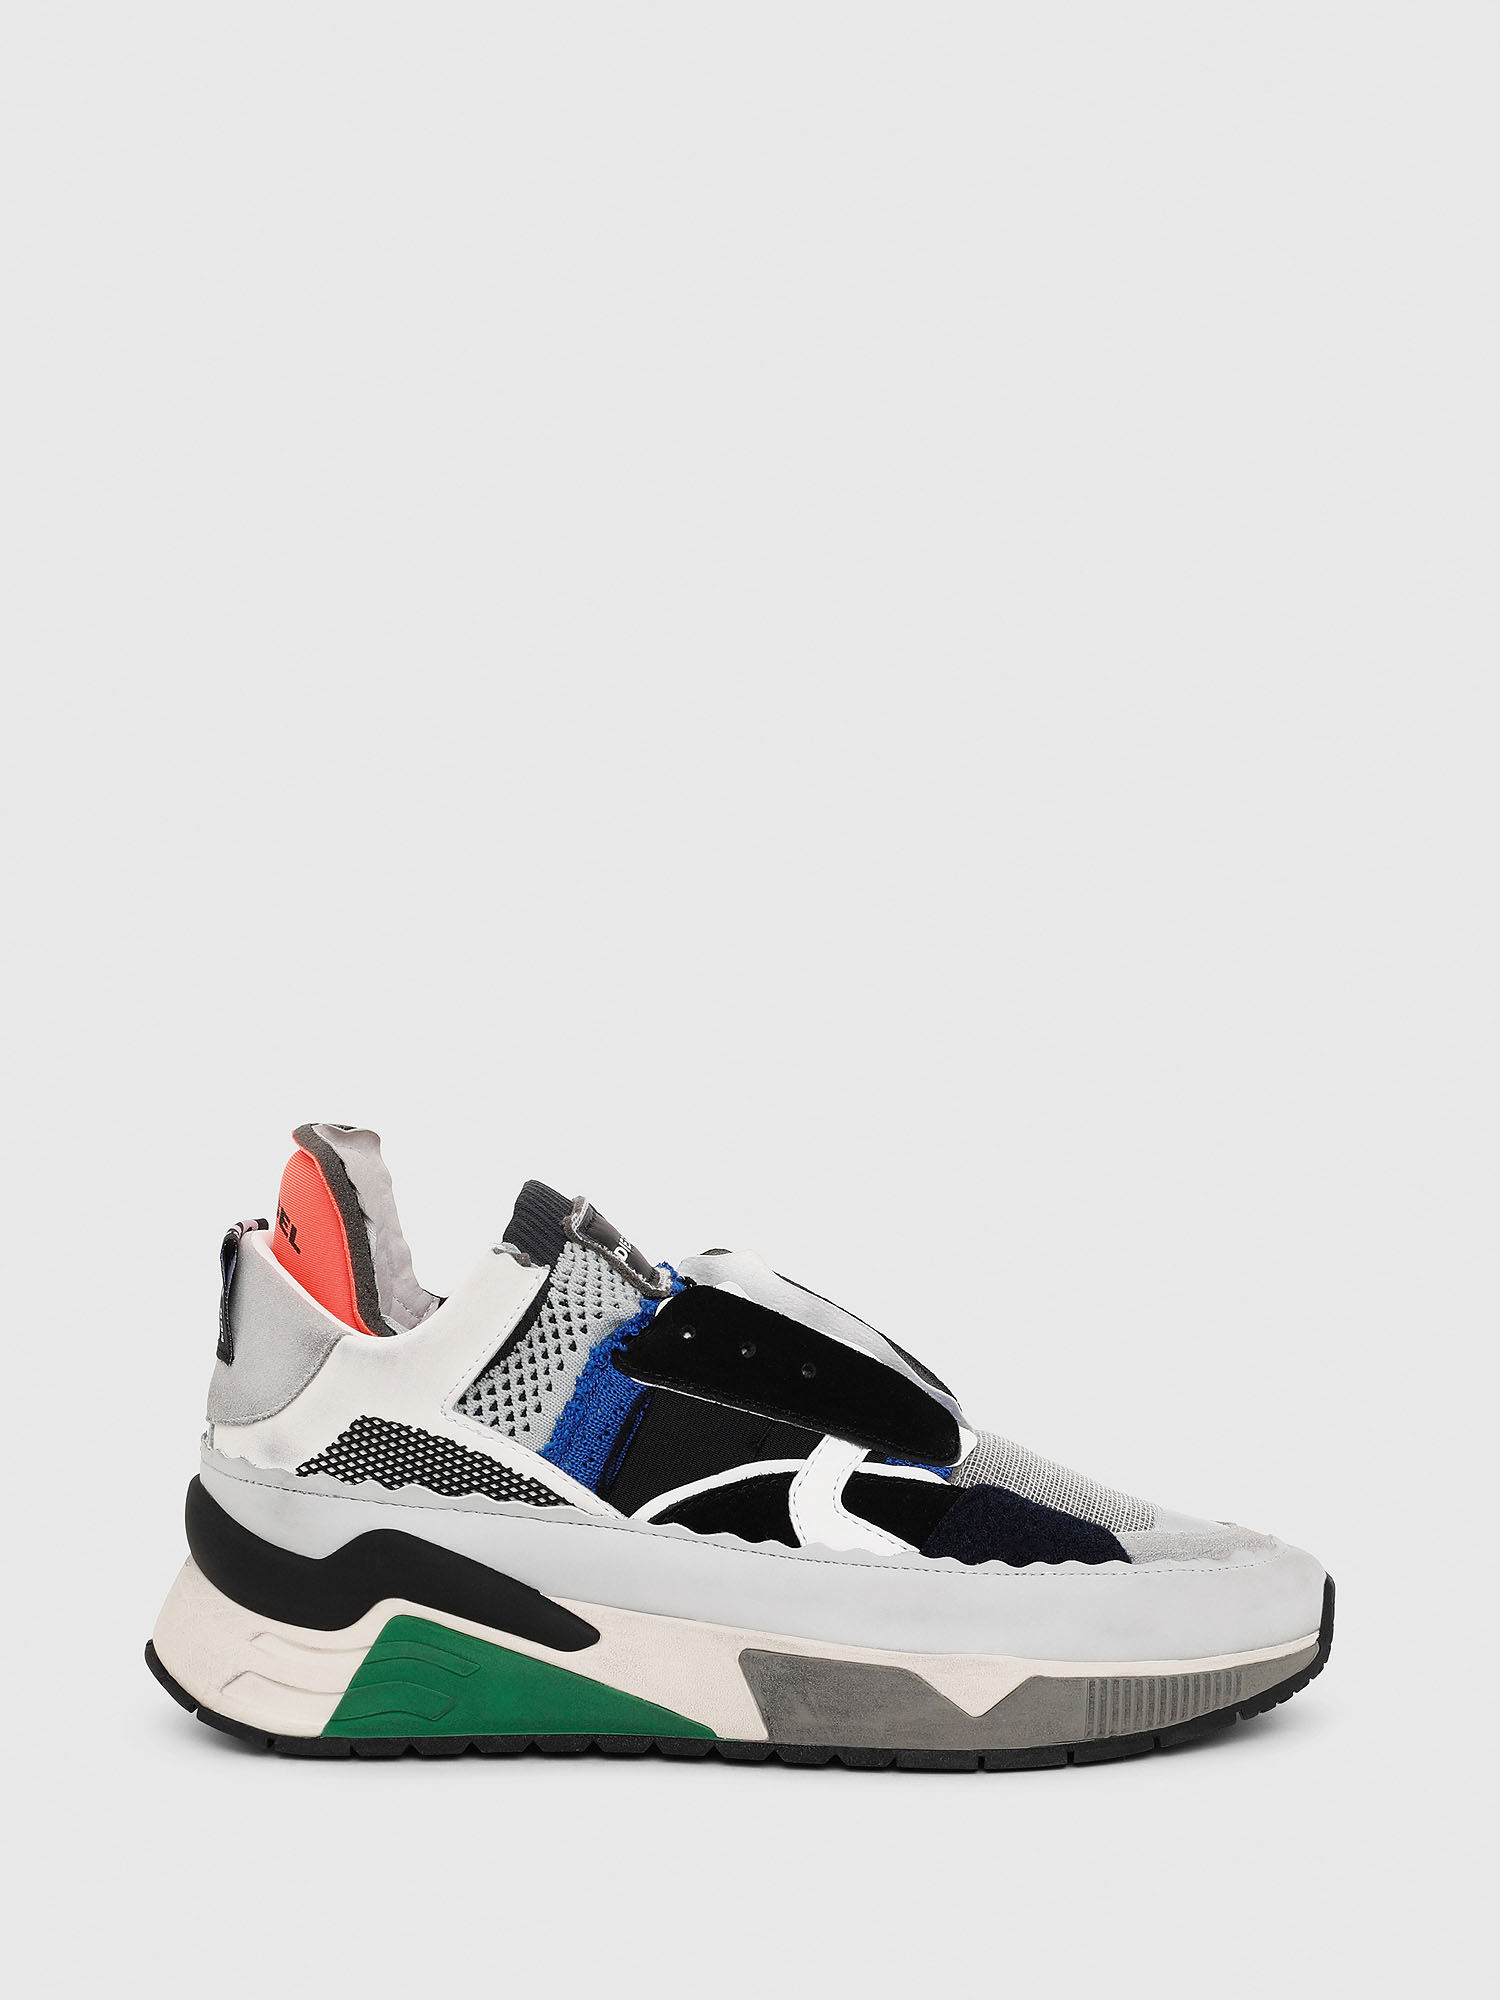 Sneakers sans lacets de style running